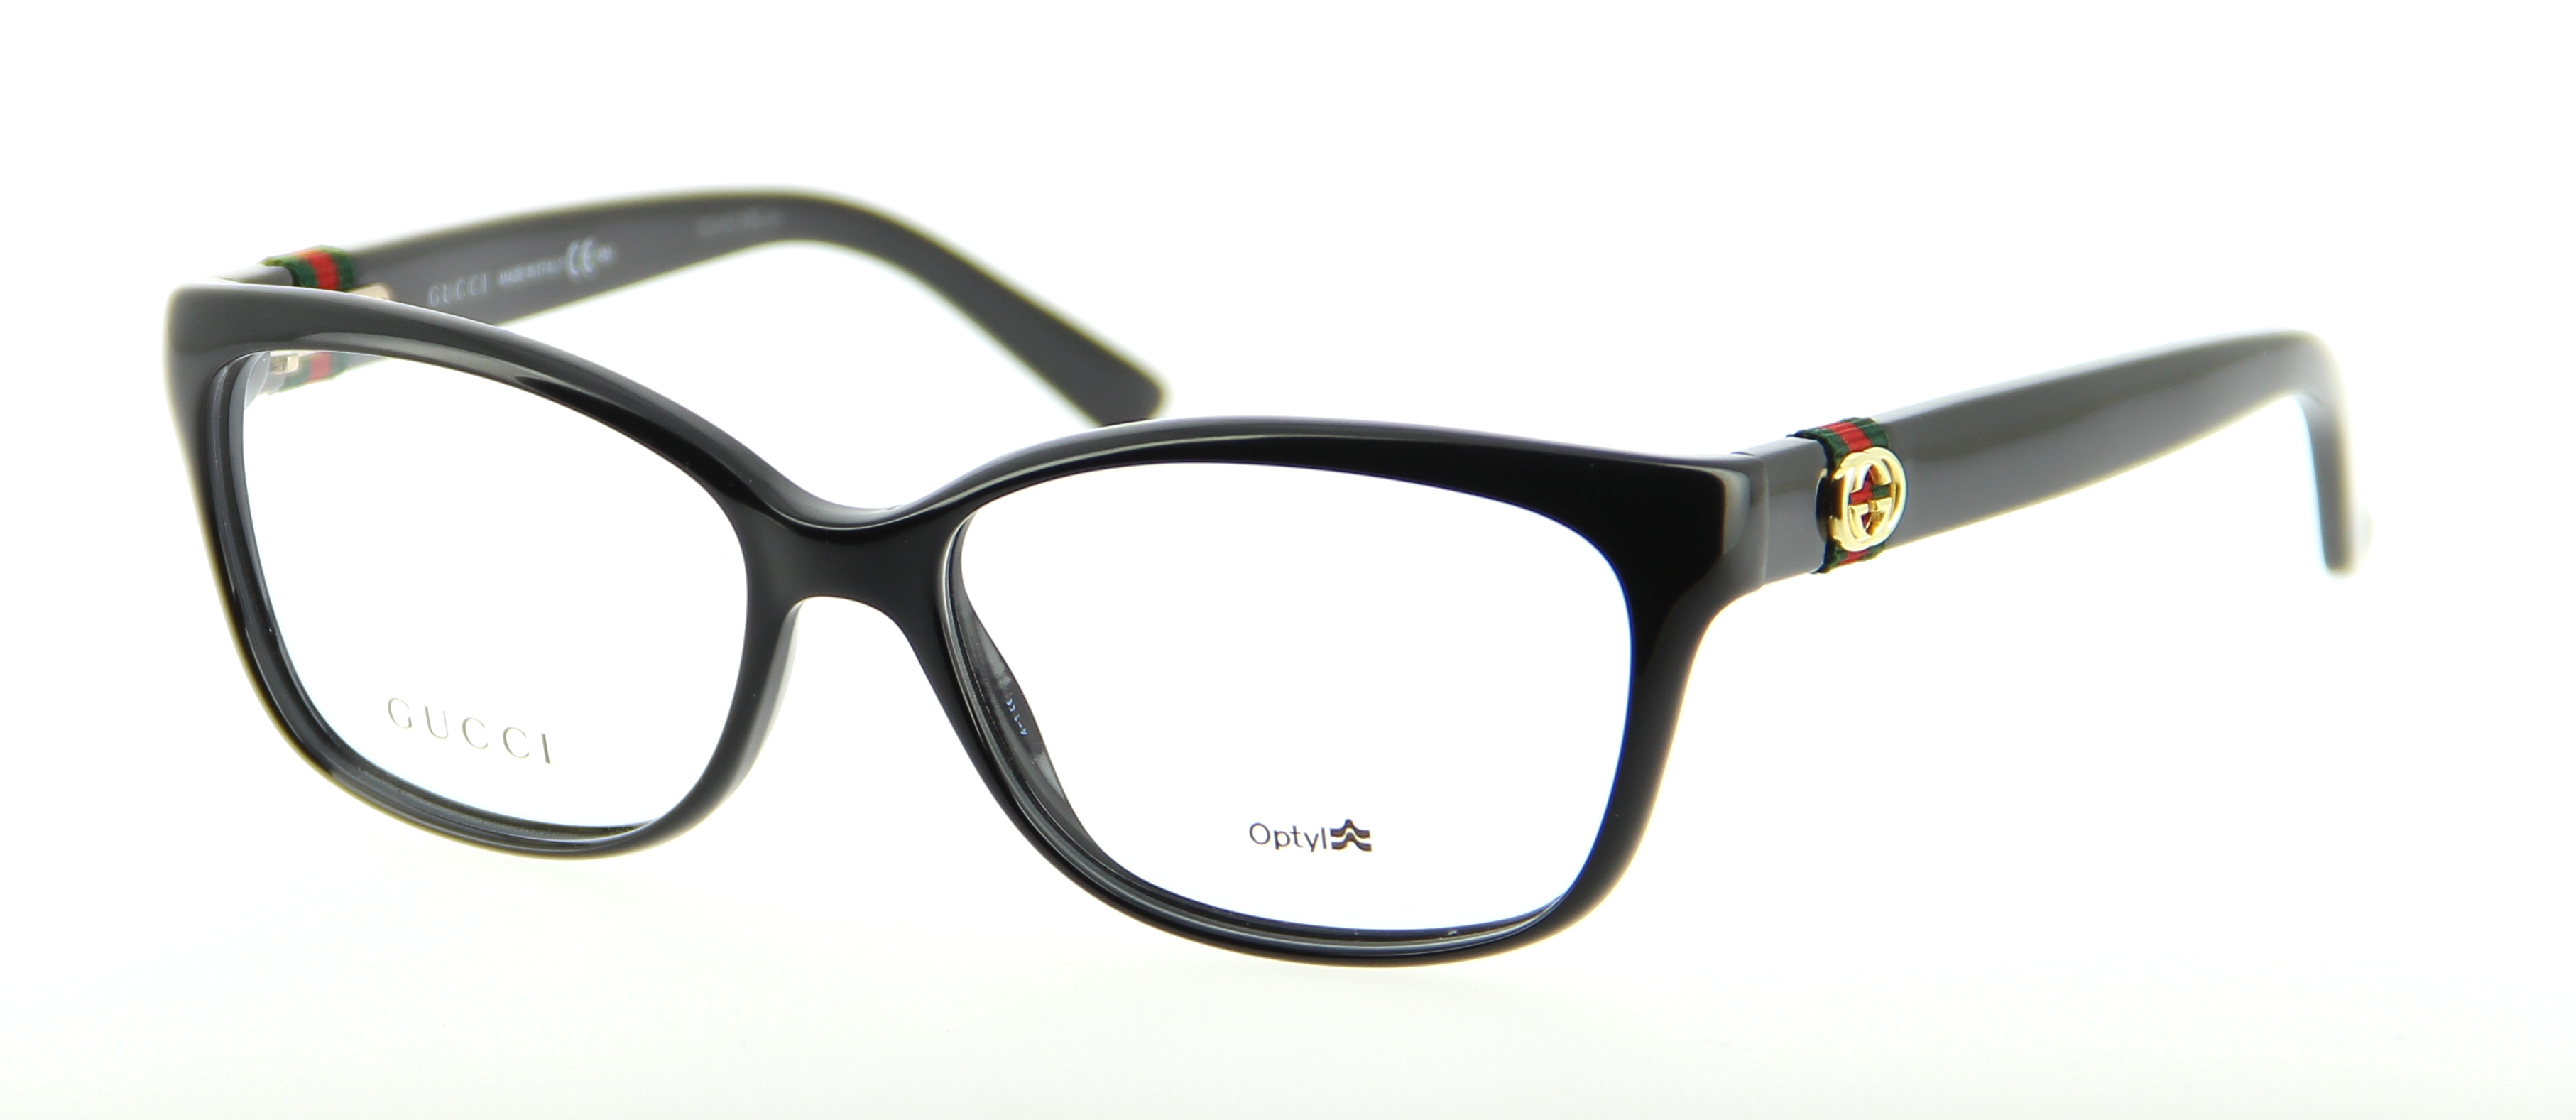 Gucci Full Frame Glasses : Eyeglasses GUCCI GG 3683 D28 53/15 Woman Noir Oval frames ...